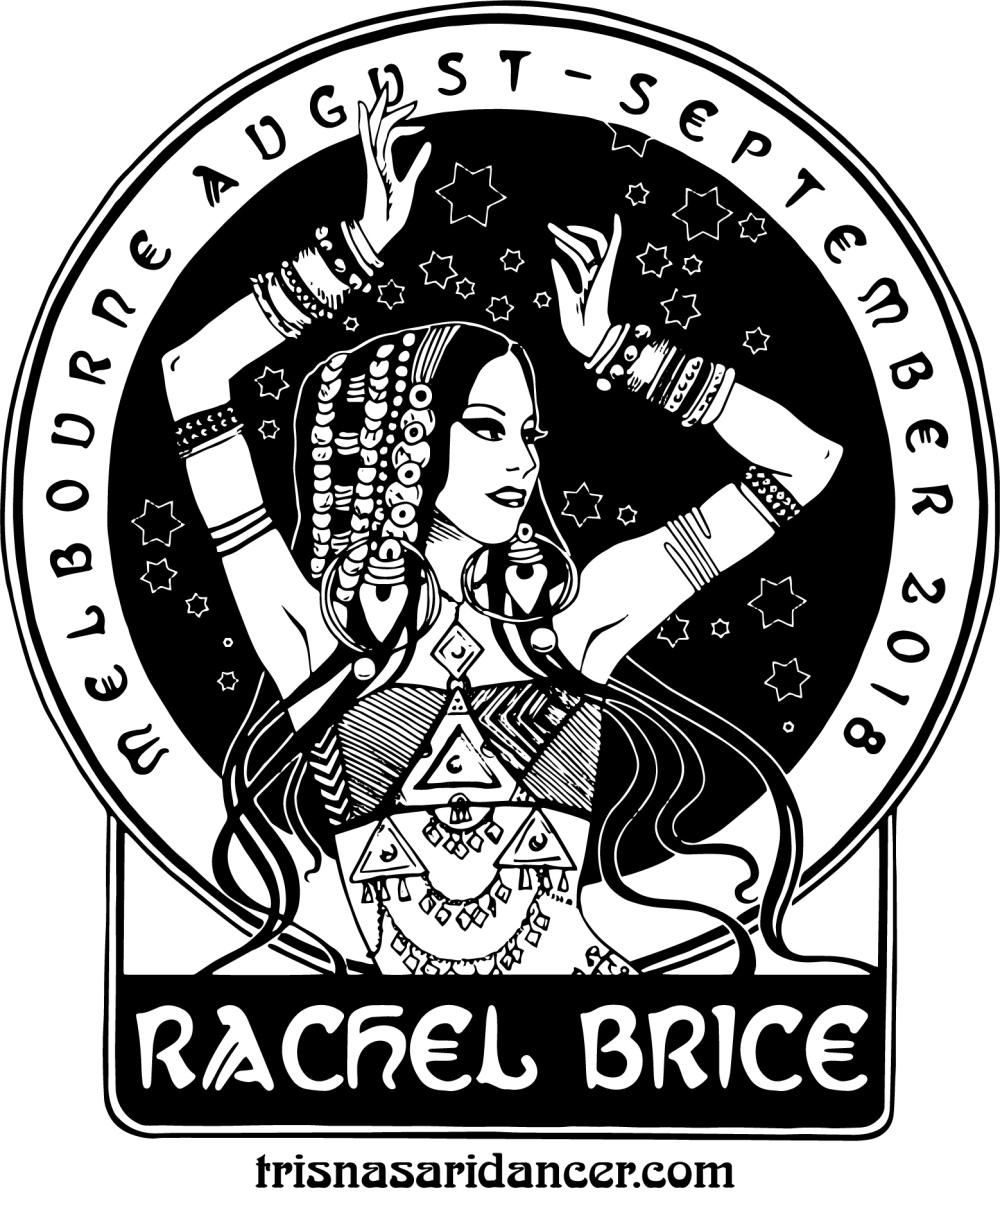 Rachel Brice 2018 logo no background.jpg